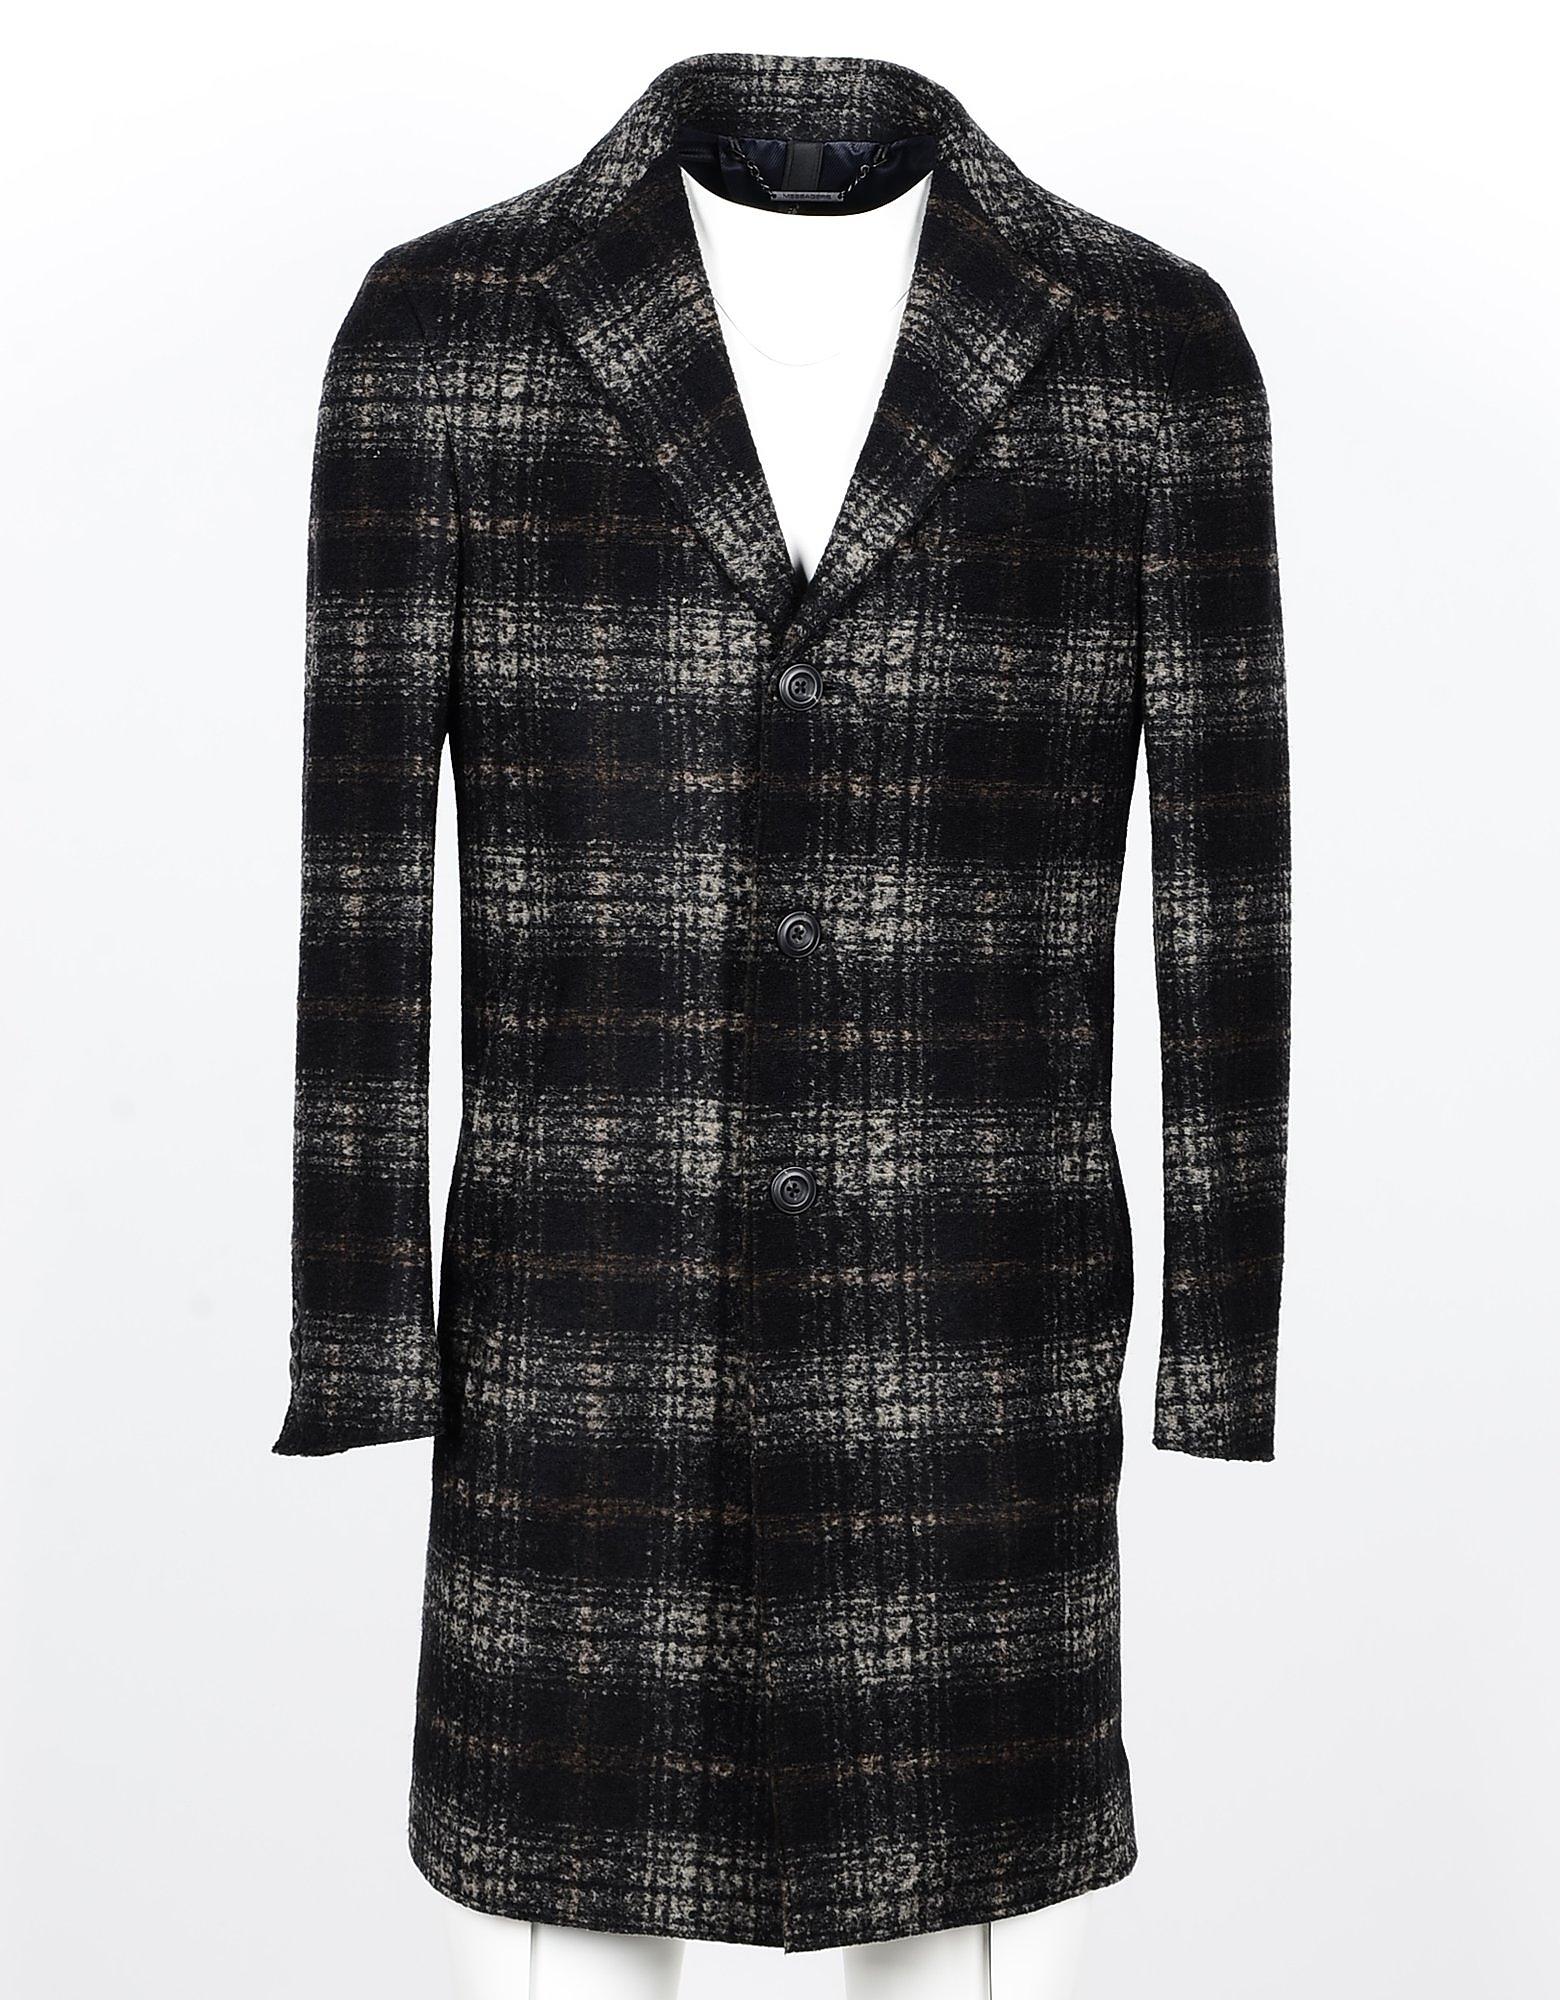 Messagerie Designer Coats & Jackets, Men's Black Coat